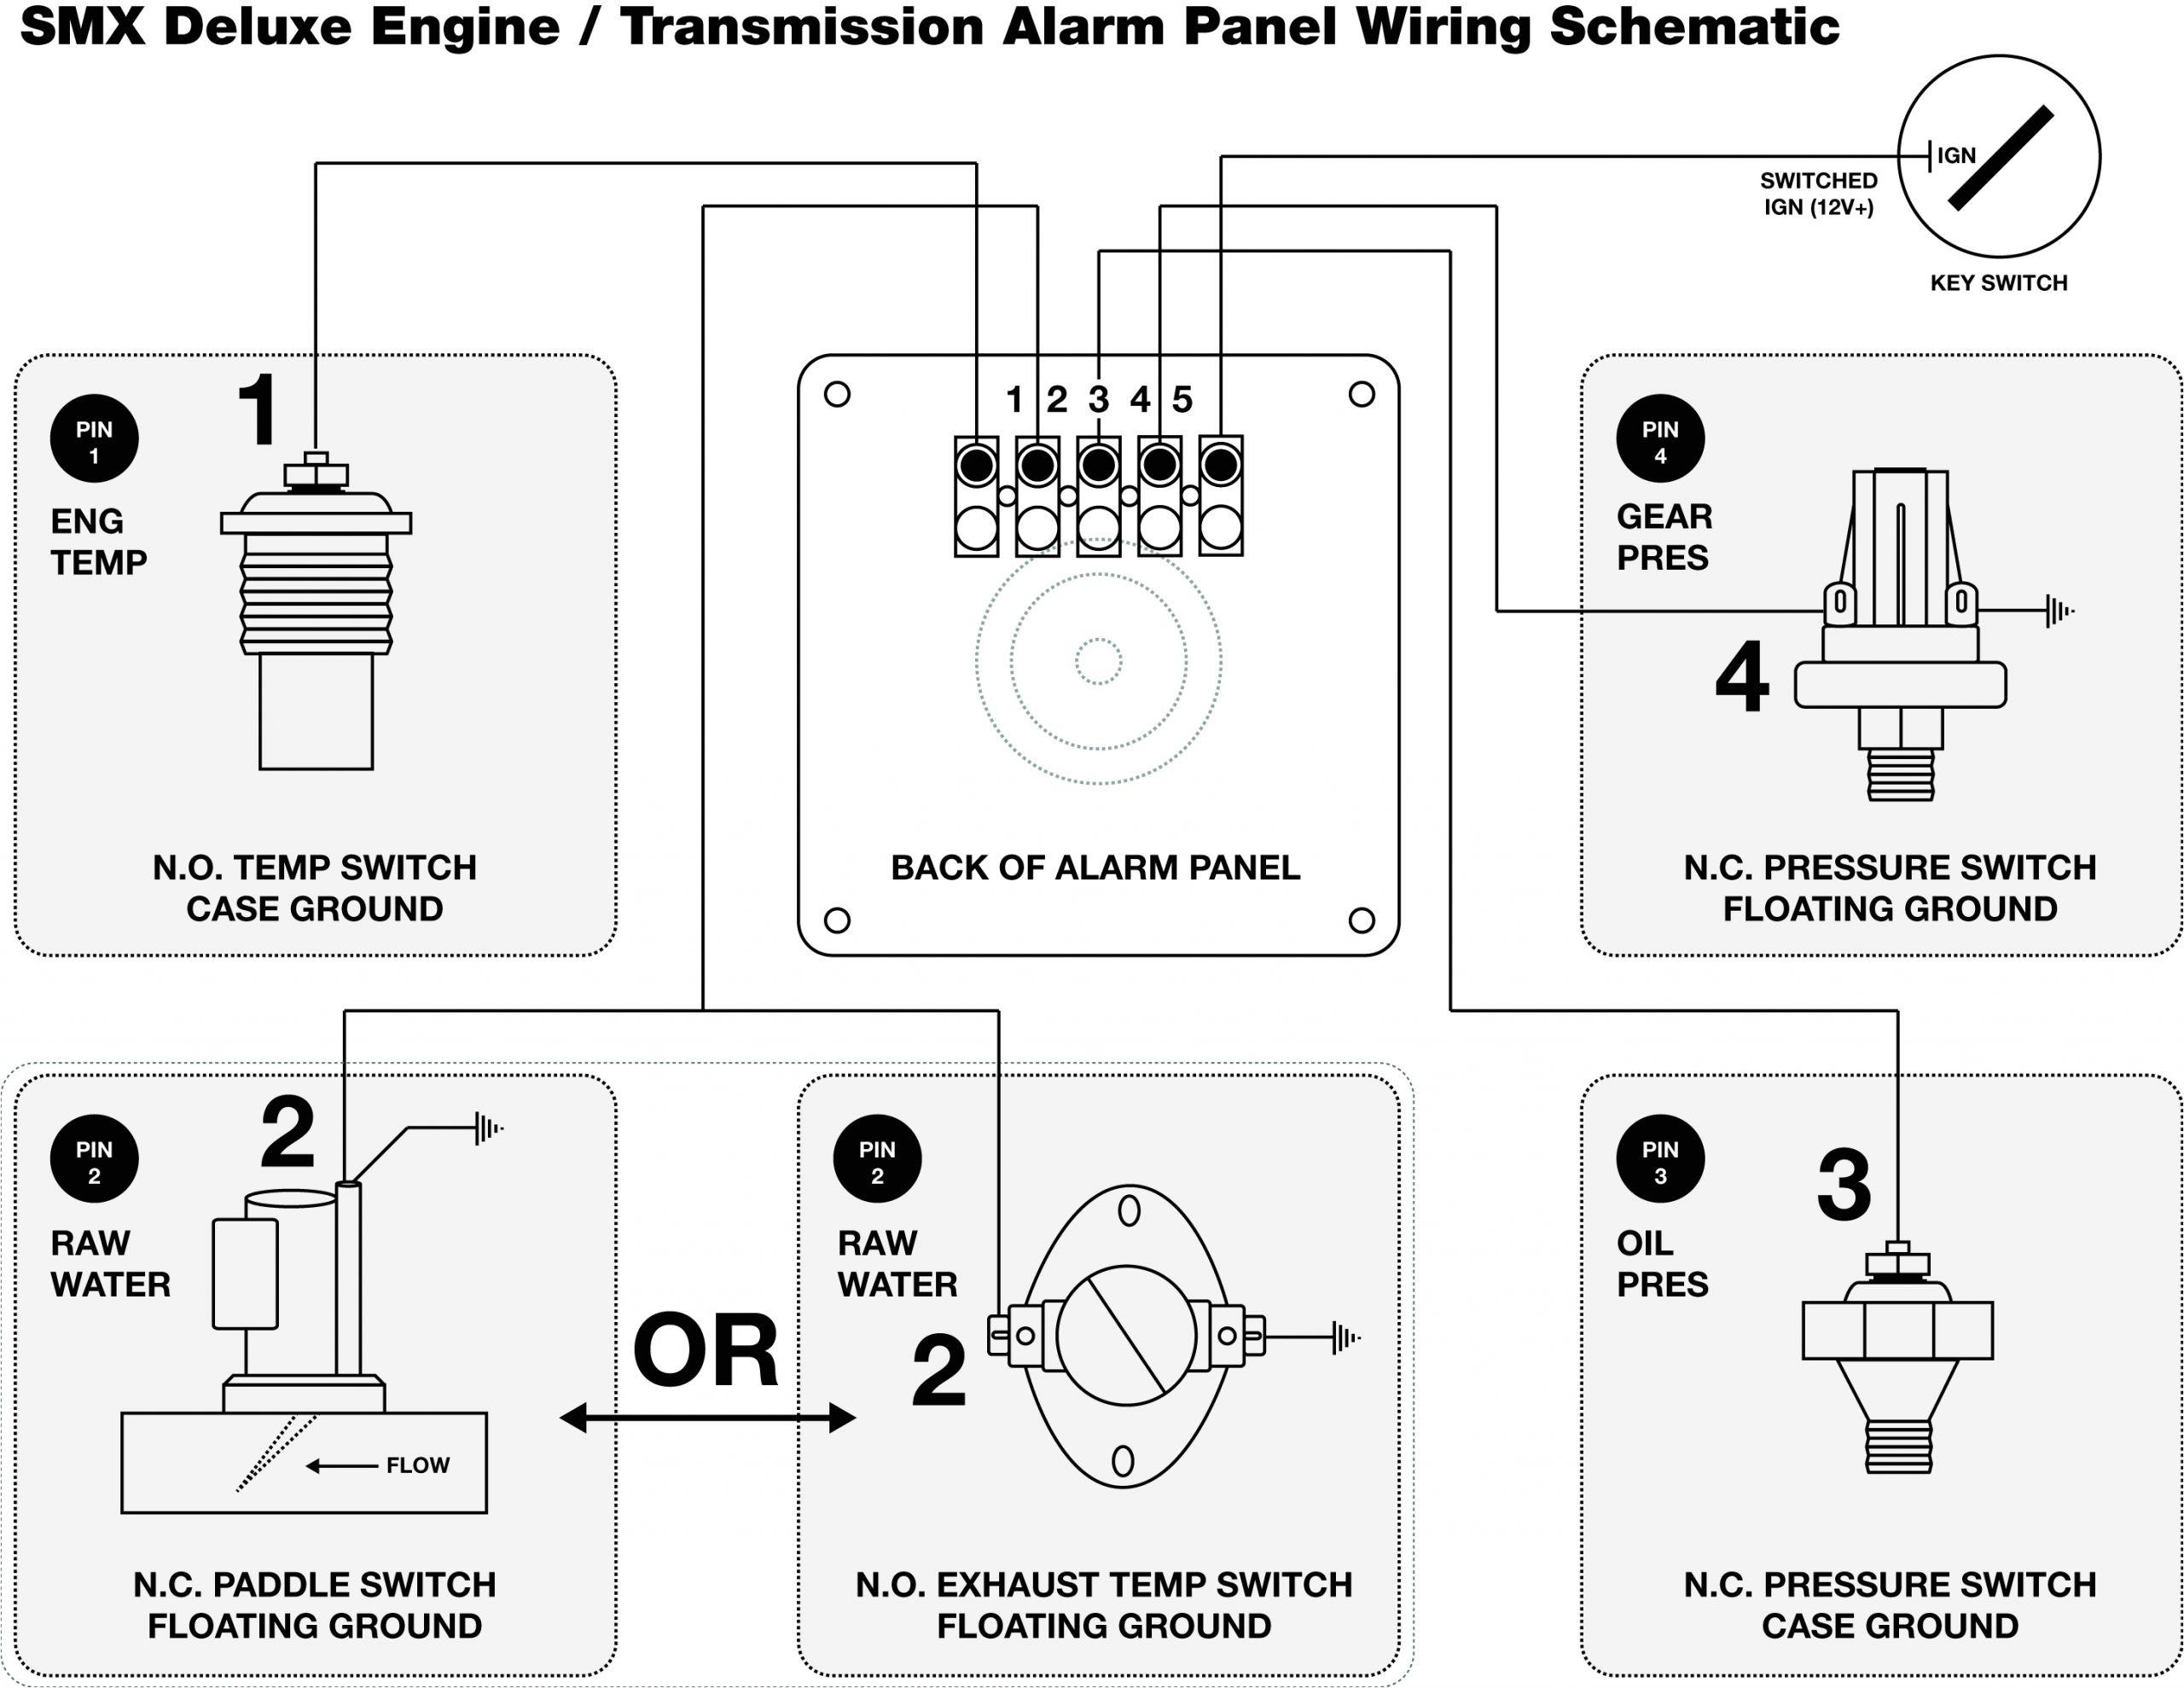 smx deluxe engine transmission alarm panel wiring jpg